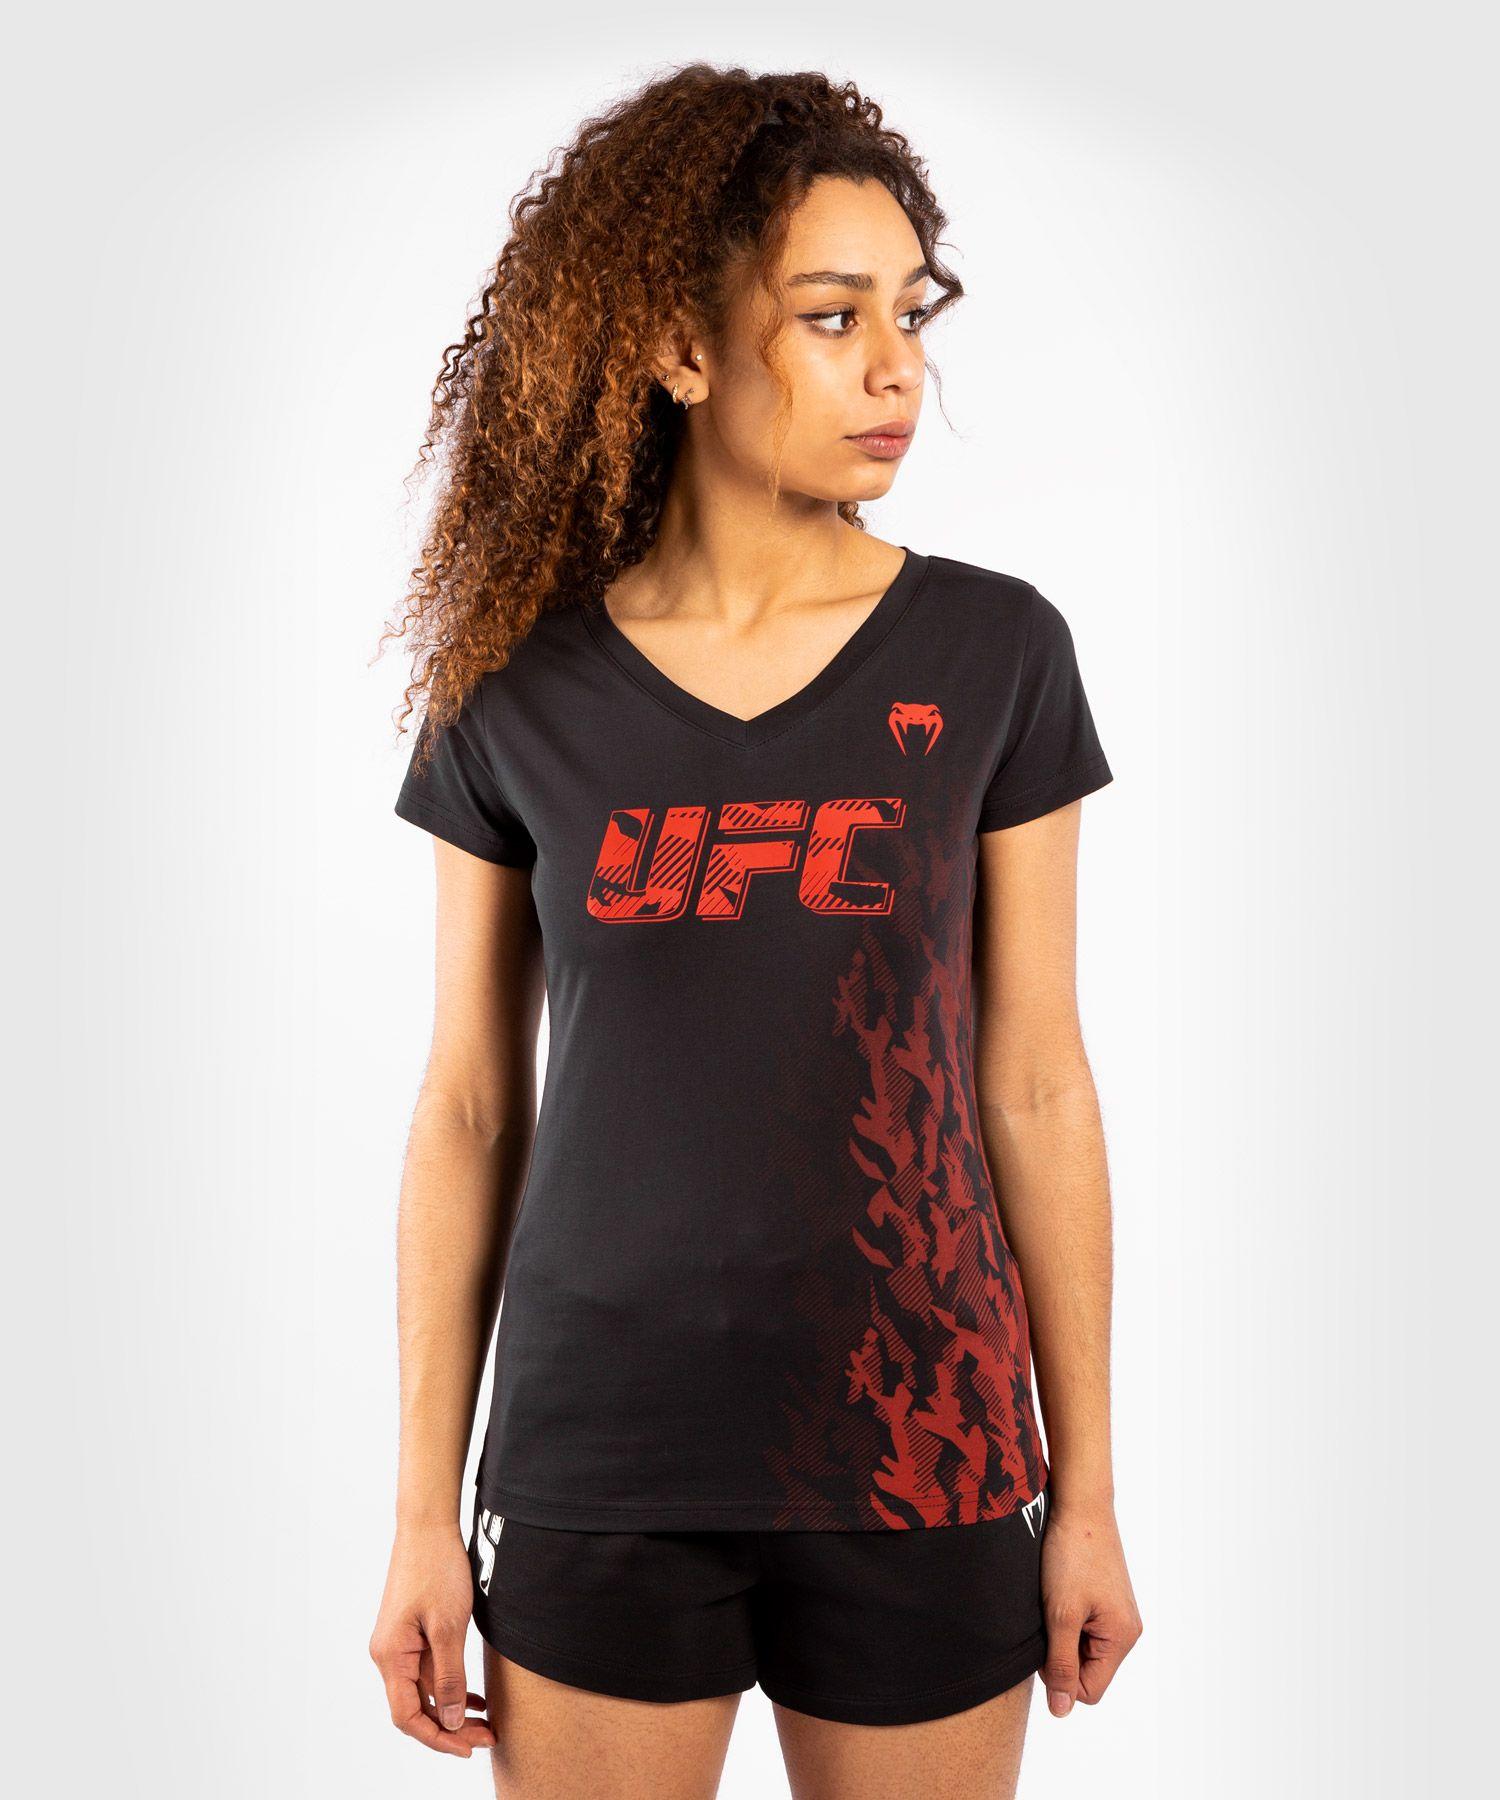 UFC Venum Authentic Fight Week Women's Short Sleeve T-shirt - Black